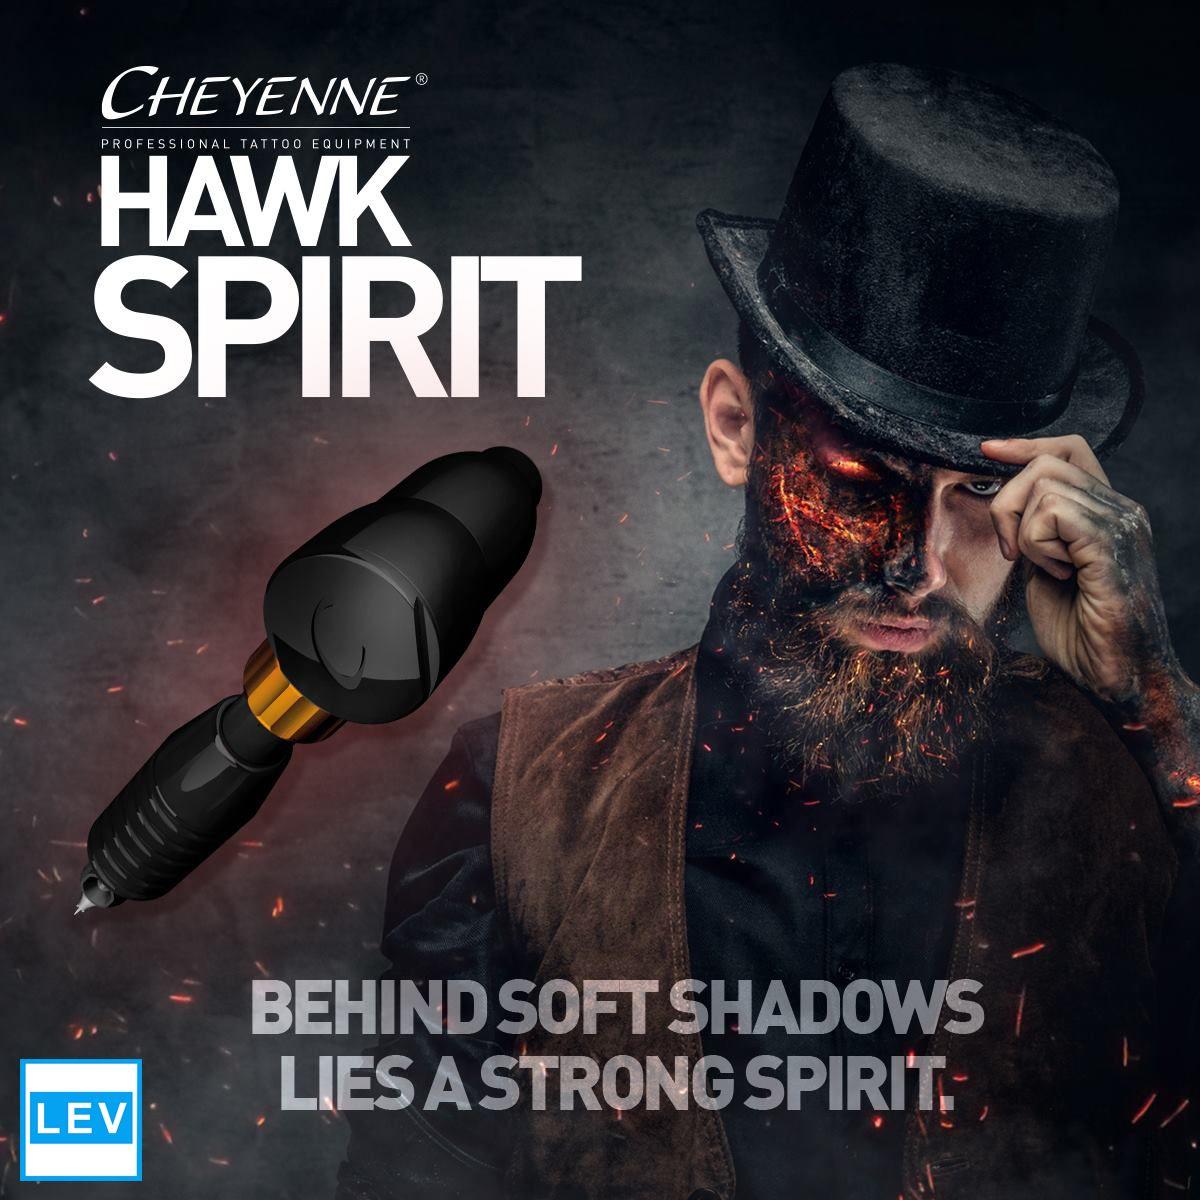 Cheyenne Hawk Spirit Drive en Grip Pakket Bestel/Order--> http://www.levgroothandel.nl/Cheyenne-Hawk-Spirit-Motor-Drive/Cheyenne-Hawk-Spirit-Drive-en-Grip-Pakket #levtattoo #levgroothandel #cheyenne #hawkspirit